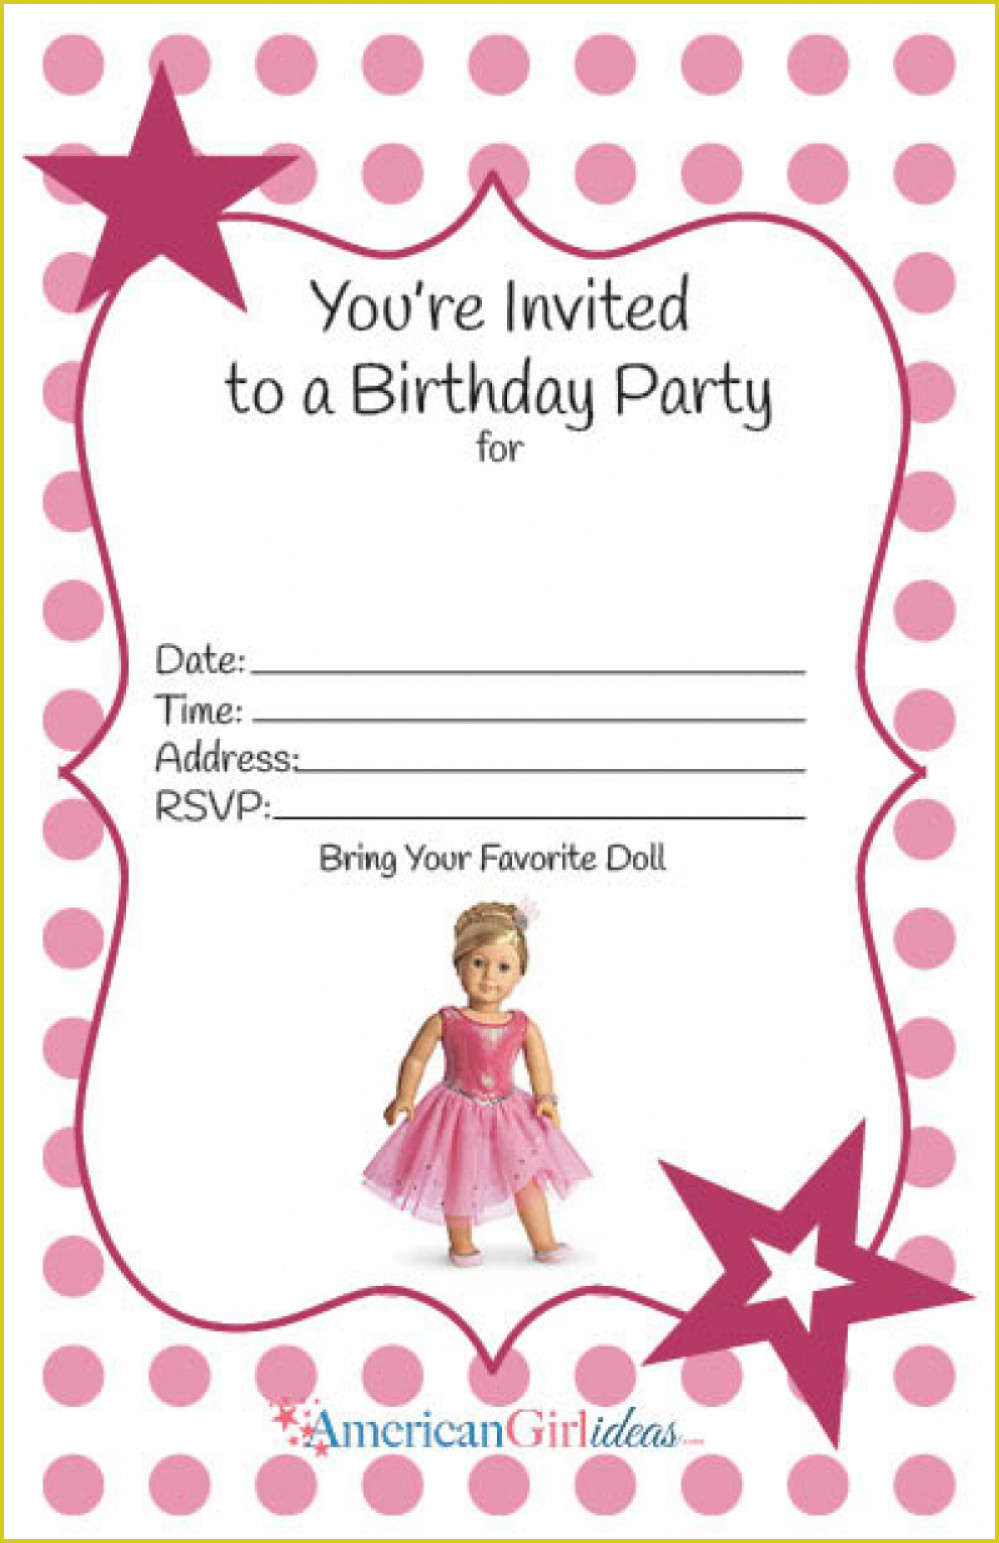 Mesmerizing American Girl Birthday Invitations Designs #3521 - American Girl Party Invitations Free Printable